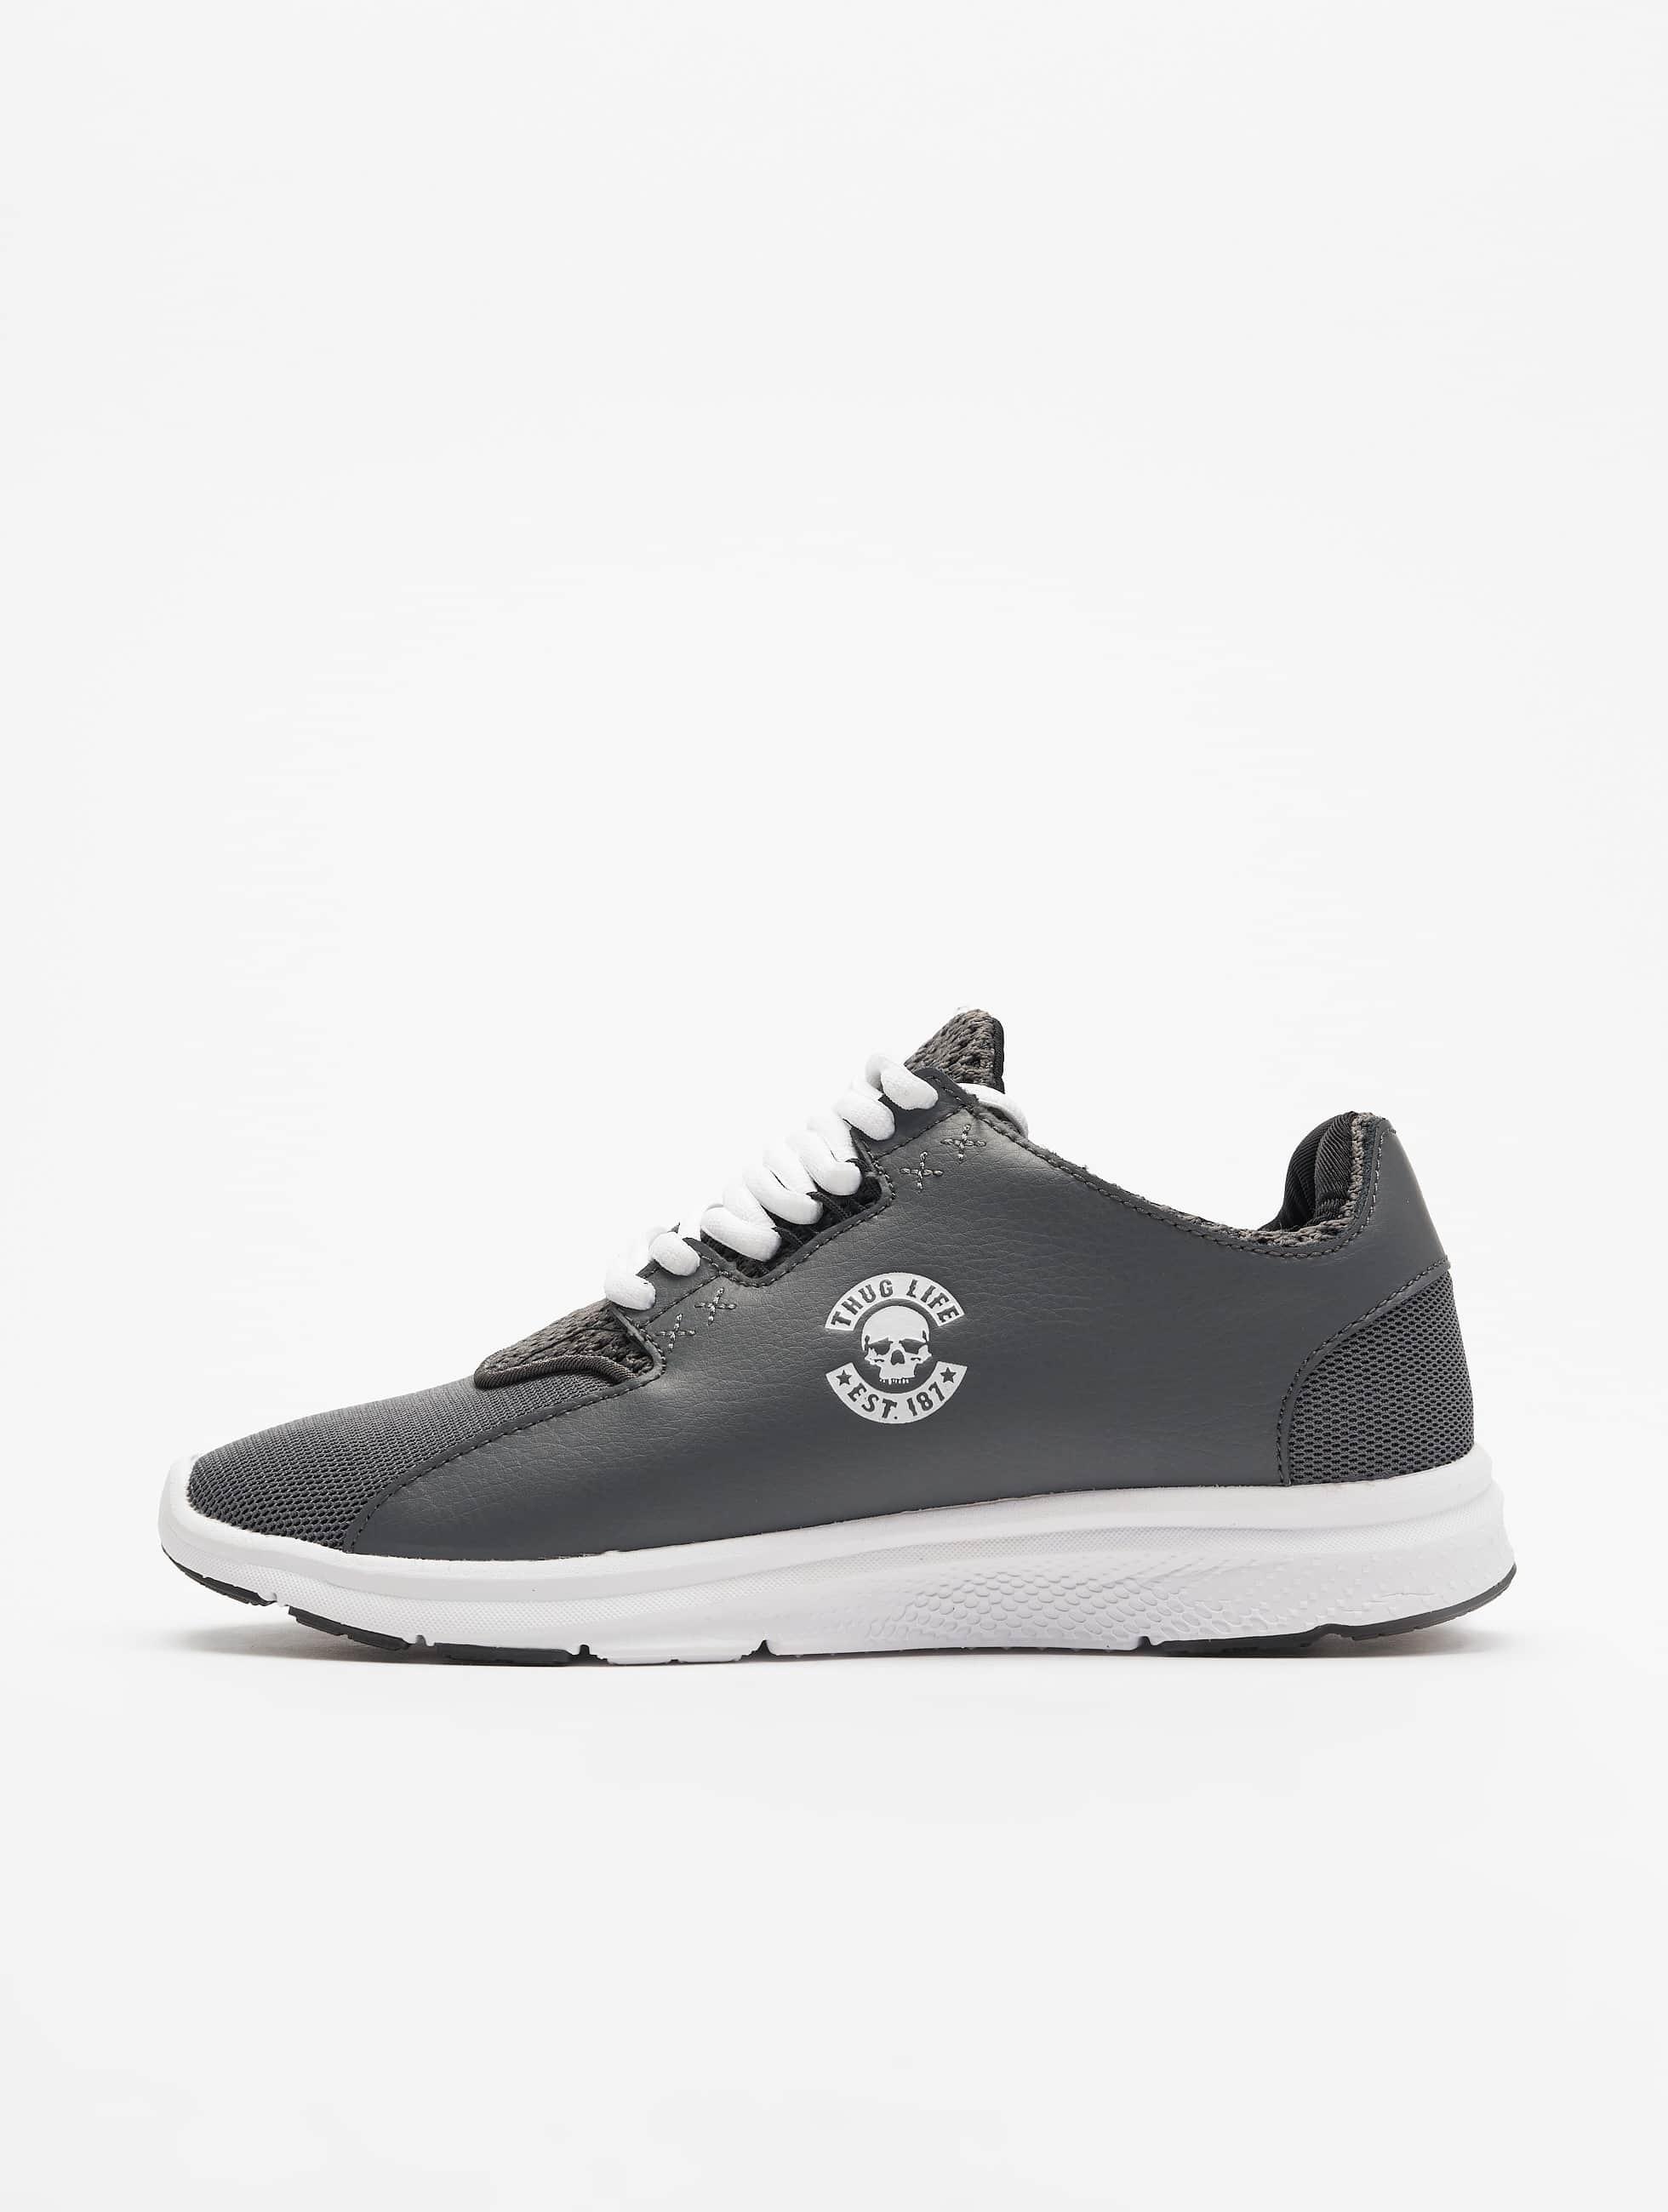 Thug Life / Sneakers Nosmis in grey 46